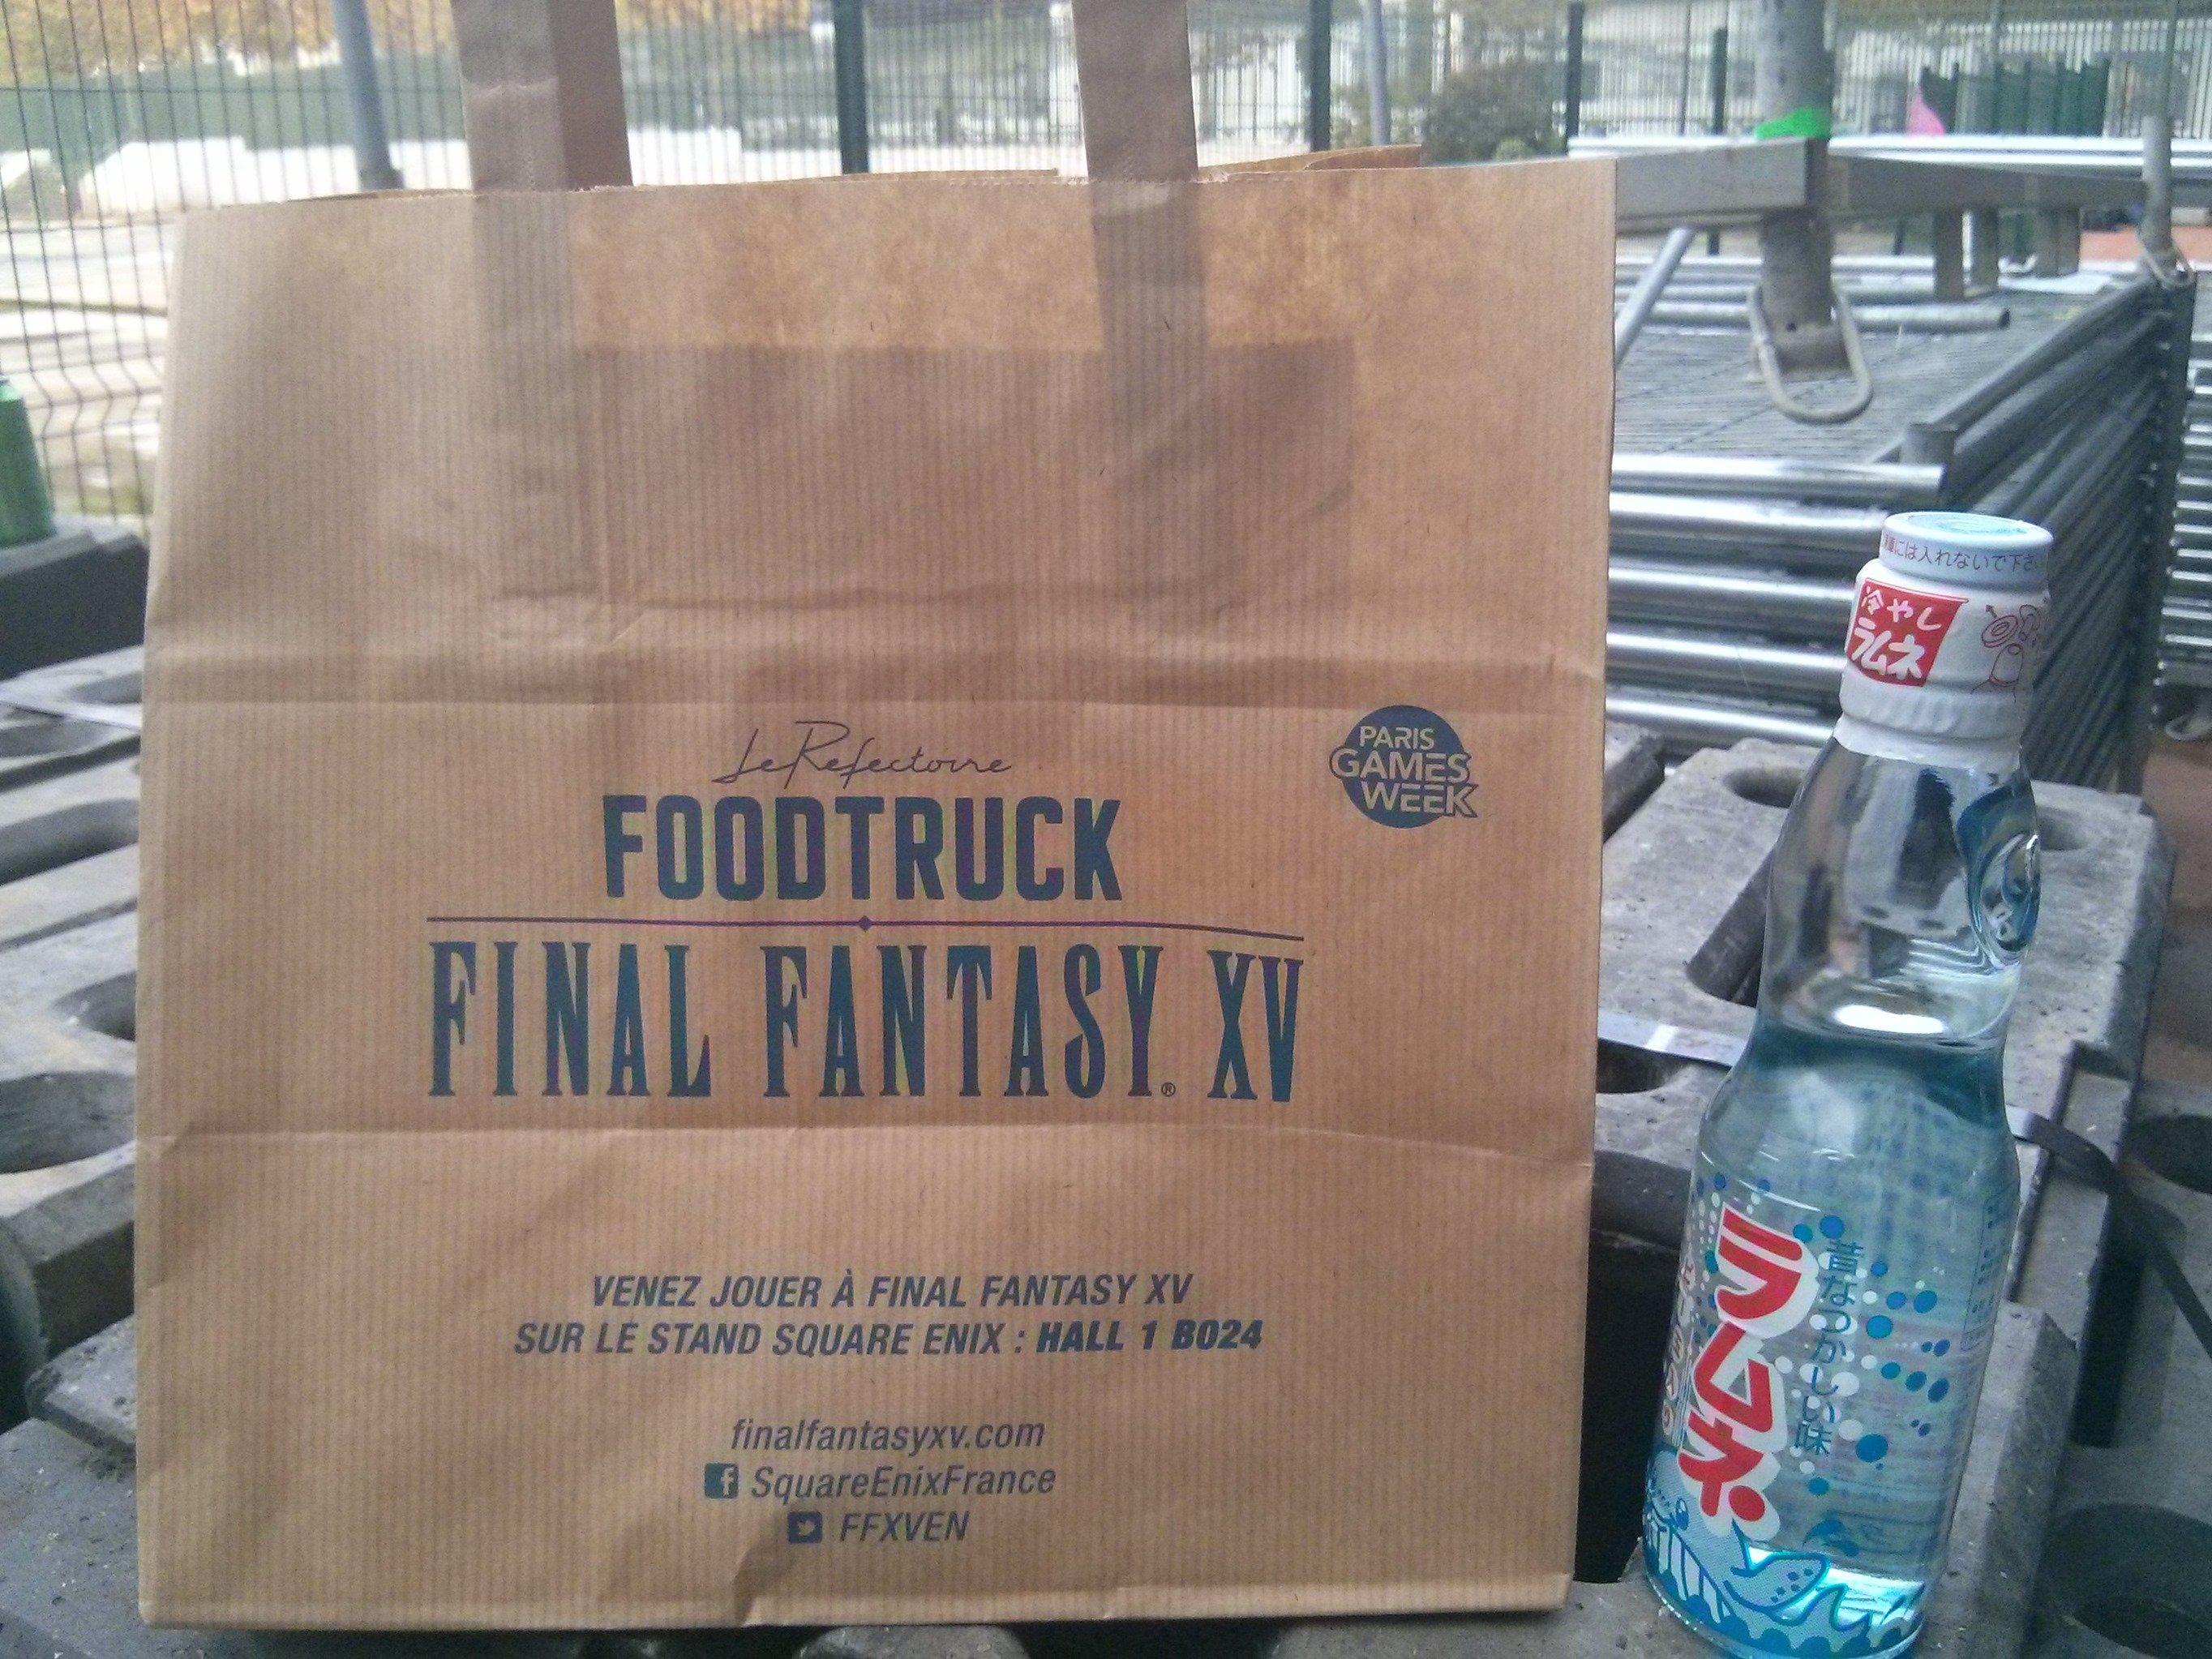 Final Fantasy XV Food Truck Serves Burgers 4